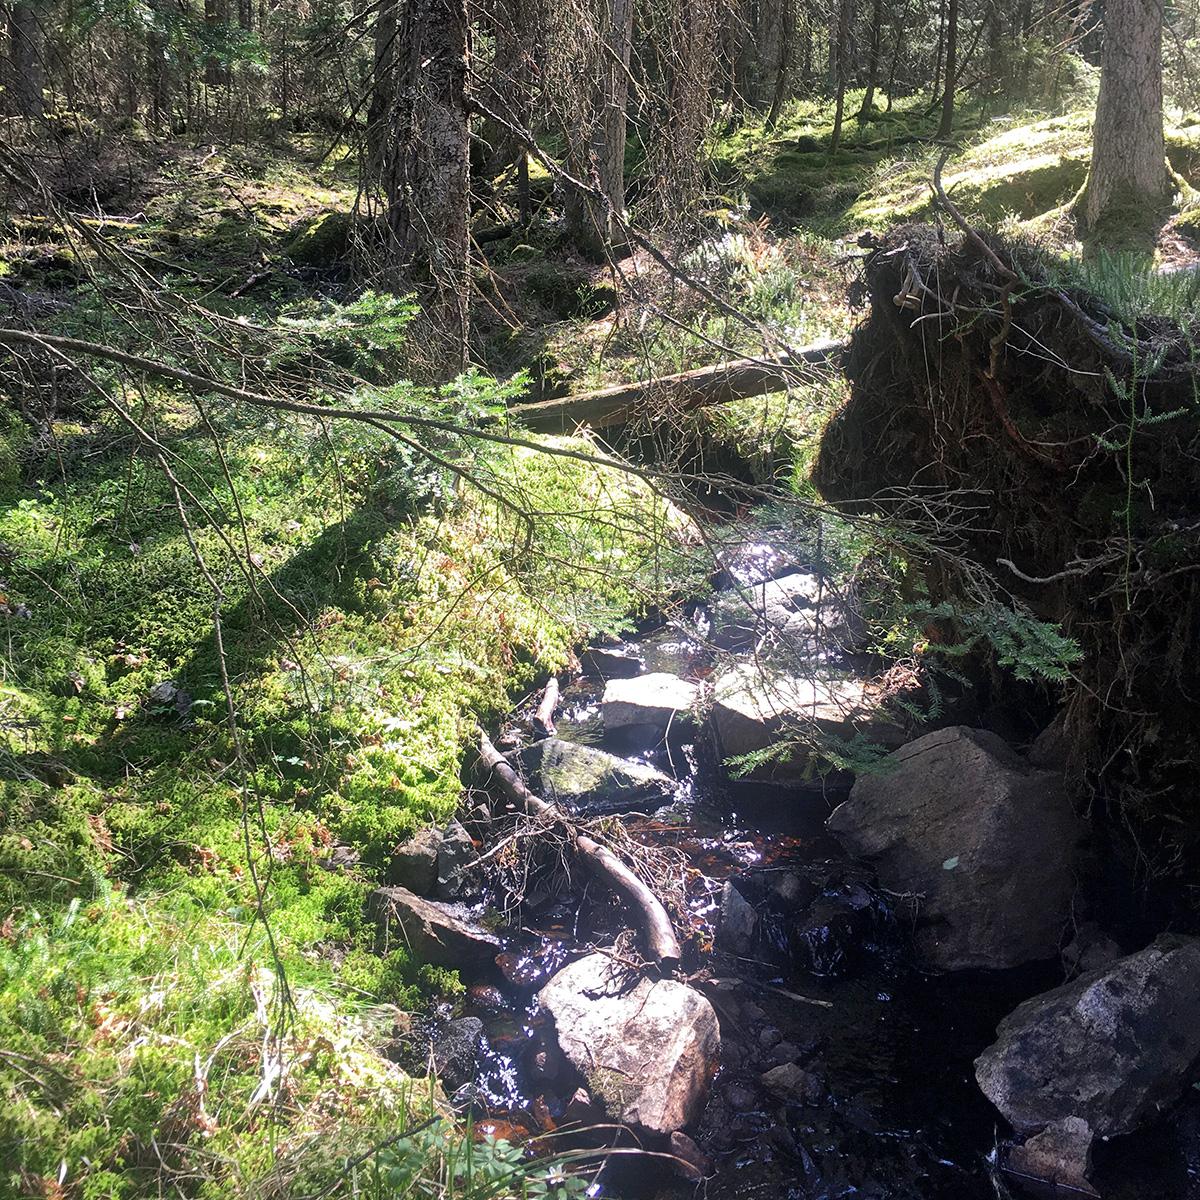 Ostörd skog med död ved ger friska levande vatten